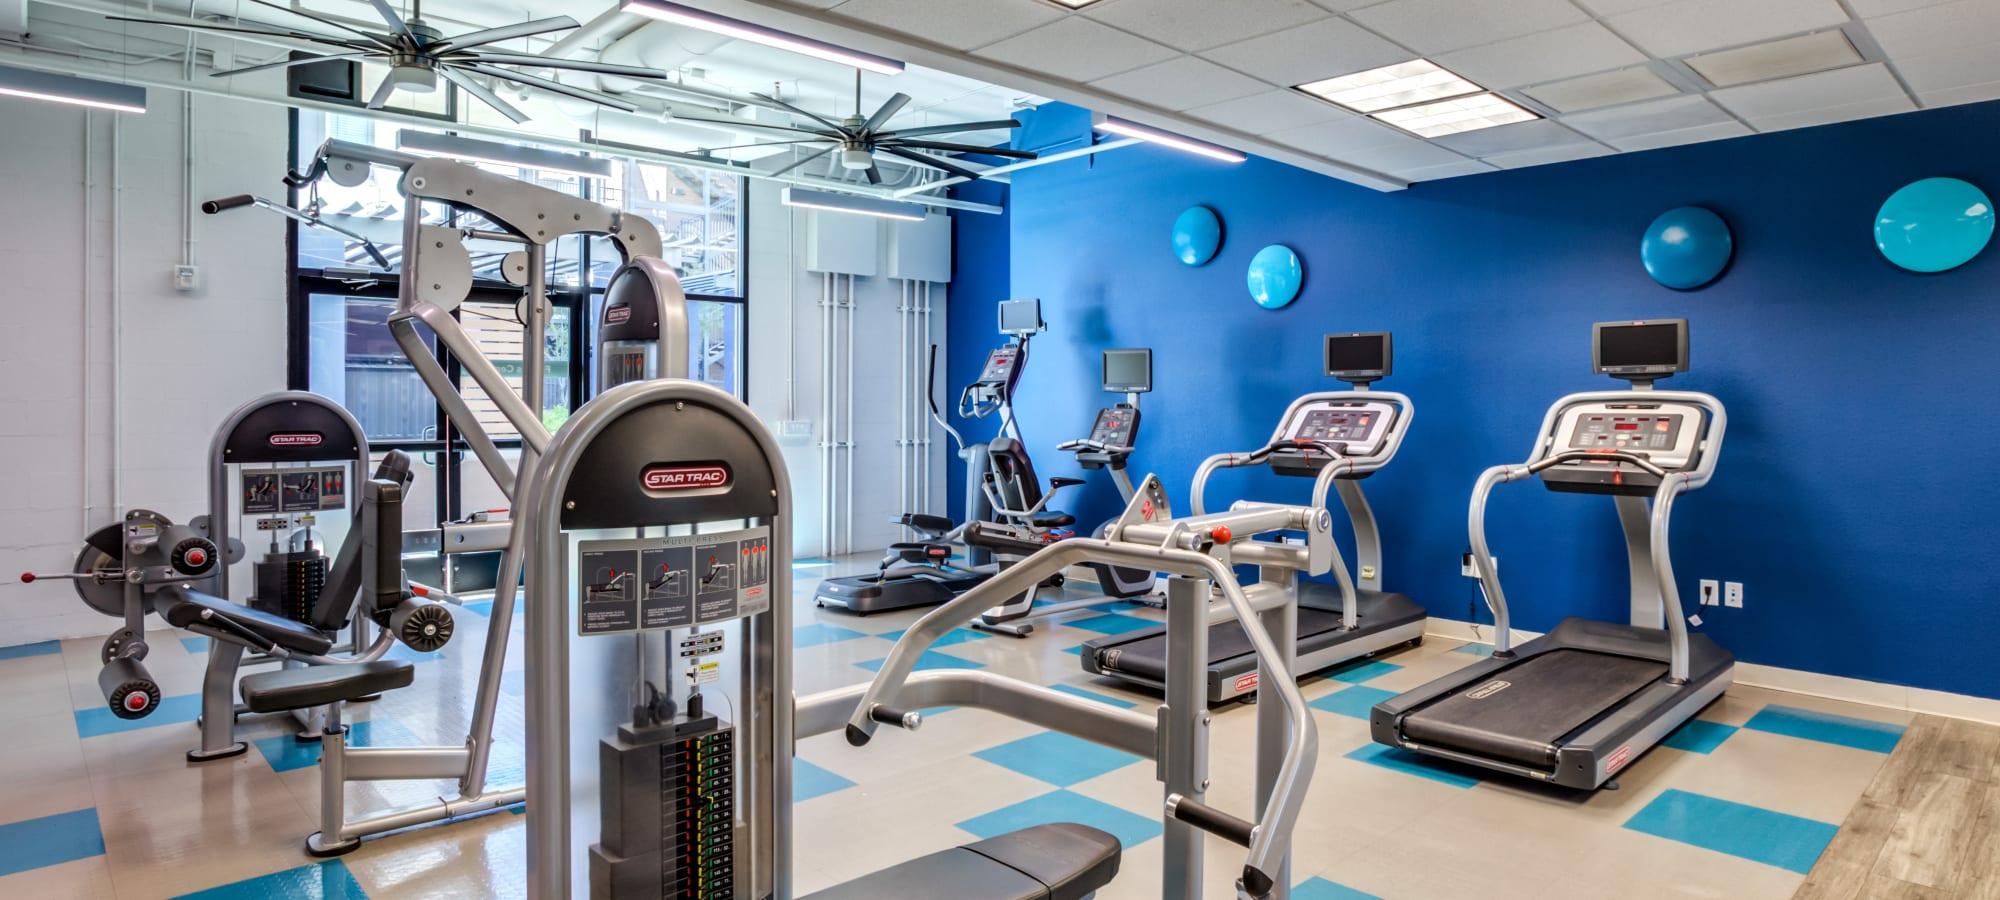 Treadmills at The Fleetwood in Tempe, Arizona